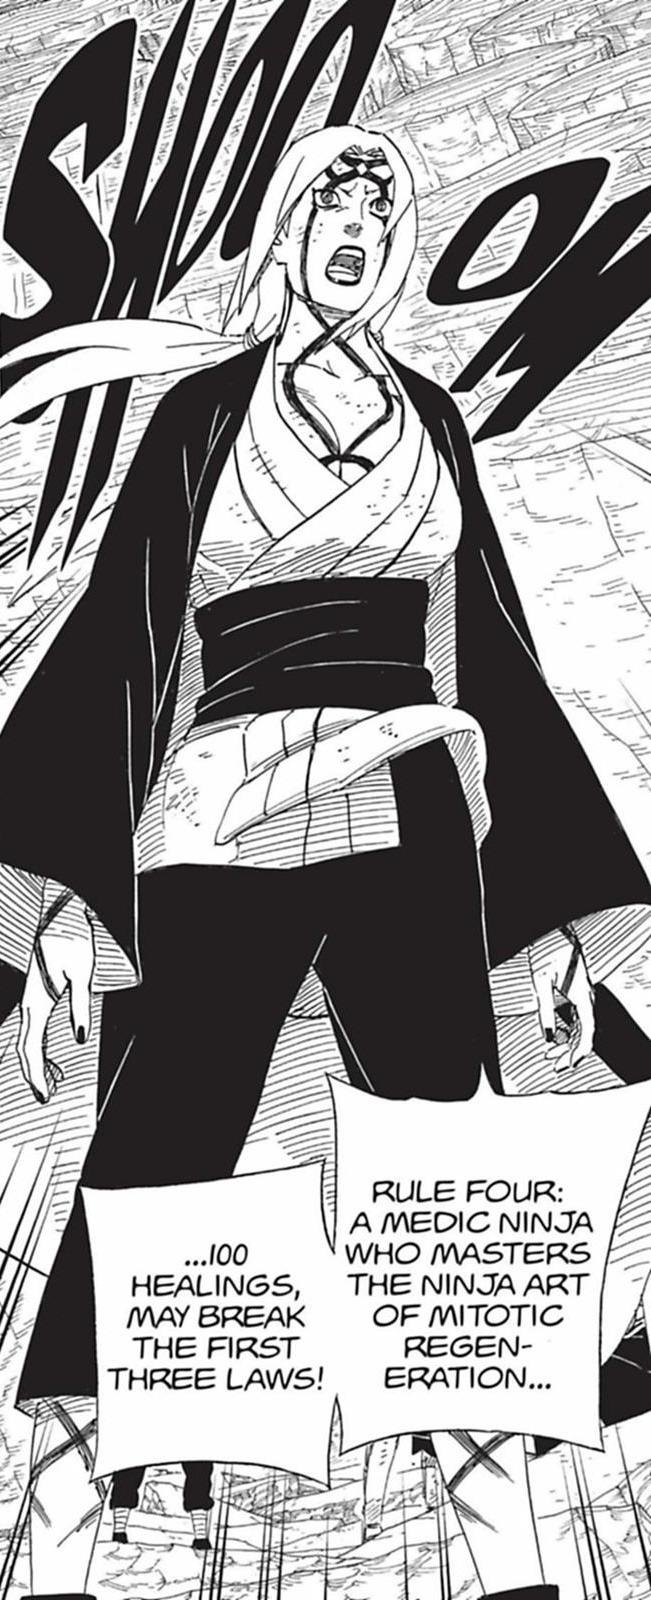 Yamato,Tsunade,mei terumi e chyio. Vs pain - Página 4 Tumblr18